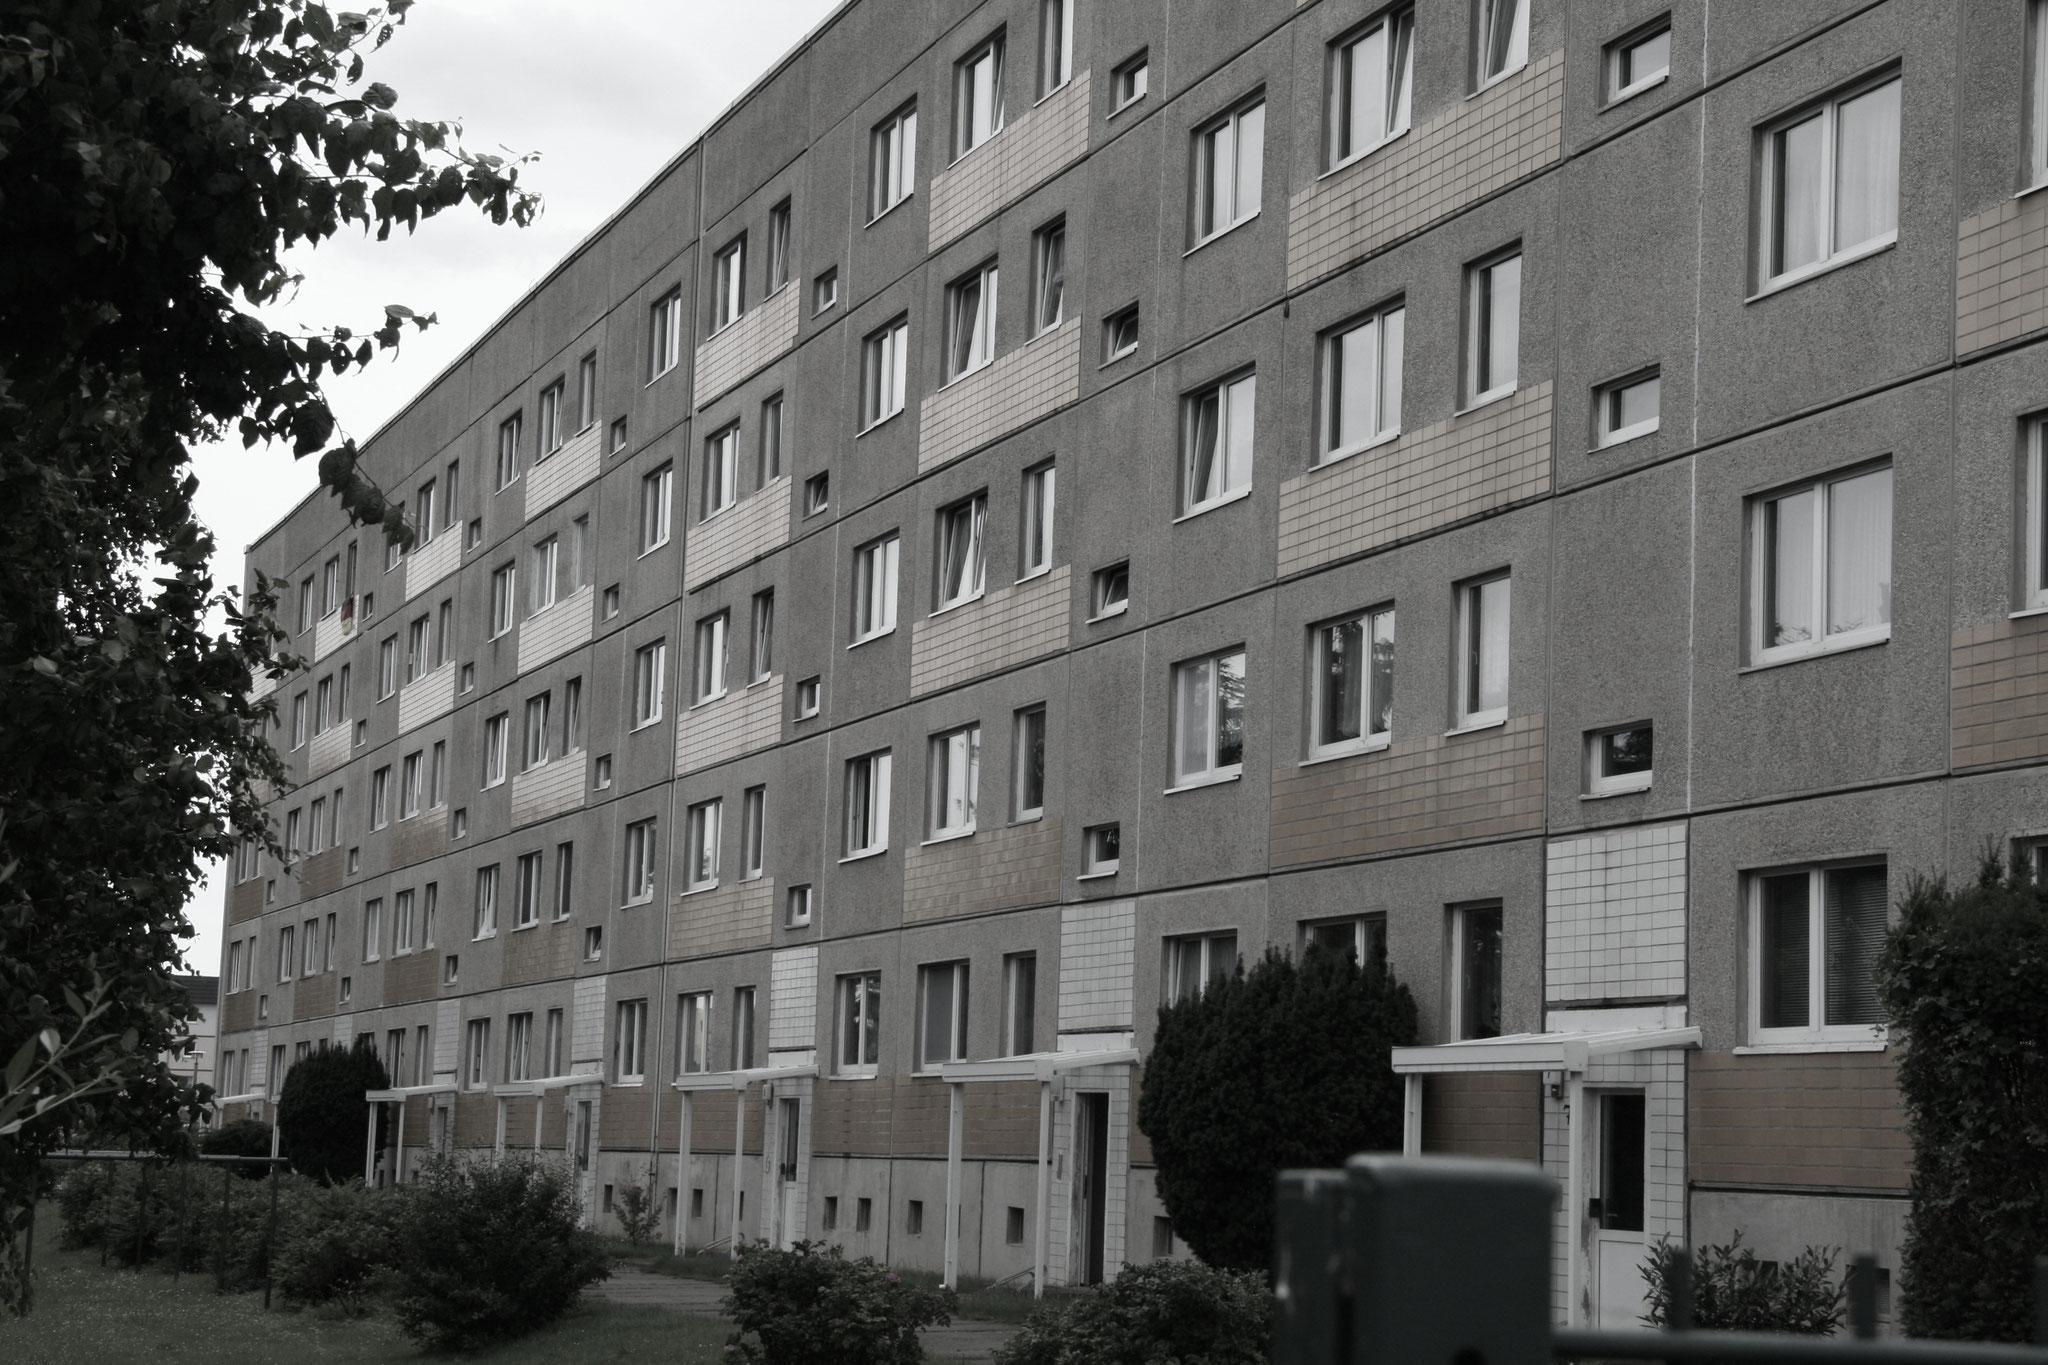 Kindheit im Neustädter Feld (Rückansicht Ulner Straße)